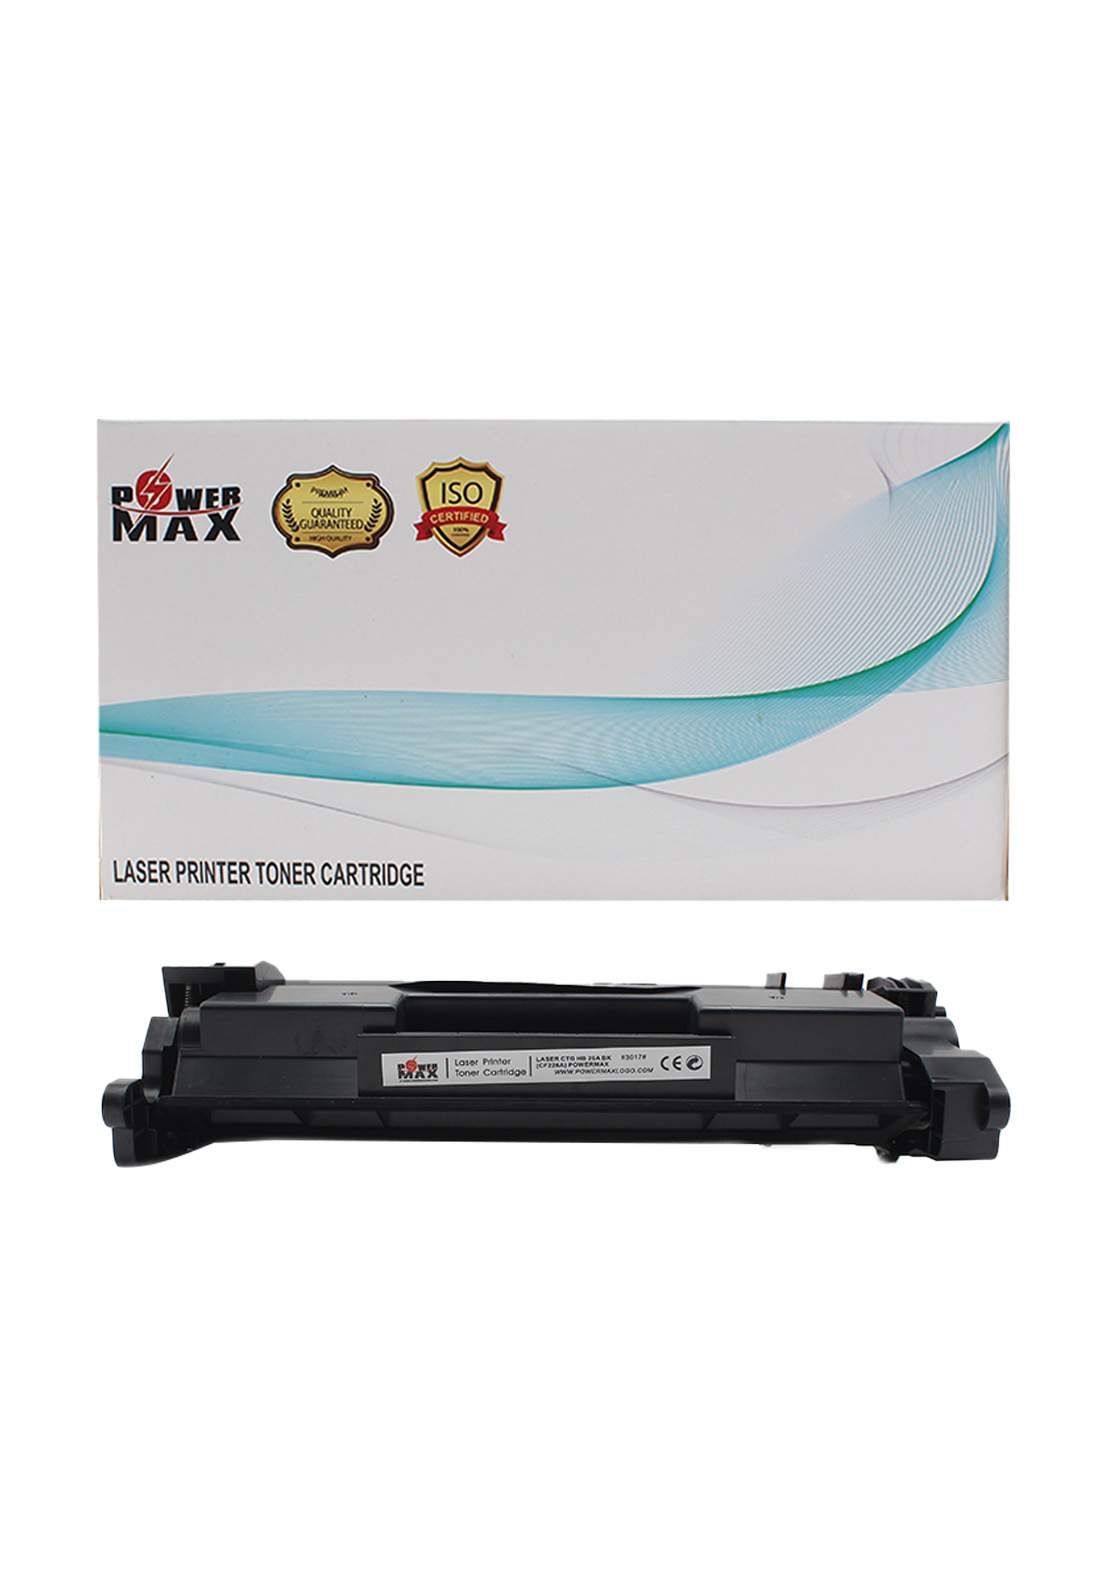 Power Max CTG HP 26A (CF226A) Laser Printer Toner Cartridge خرطوشة حبر